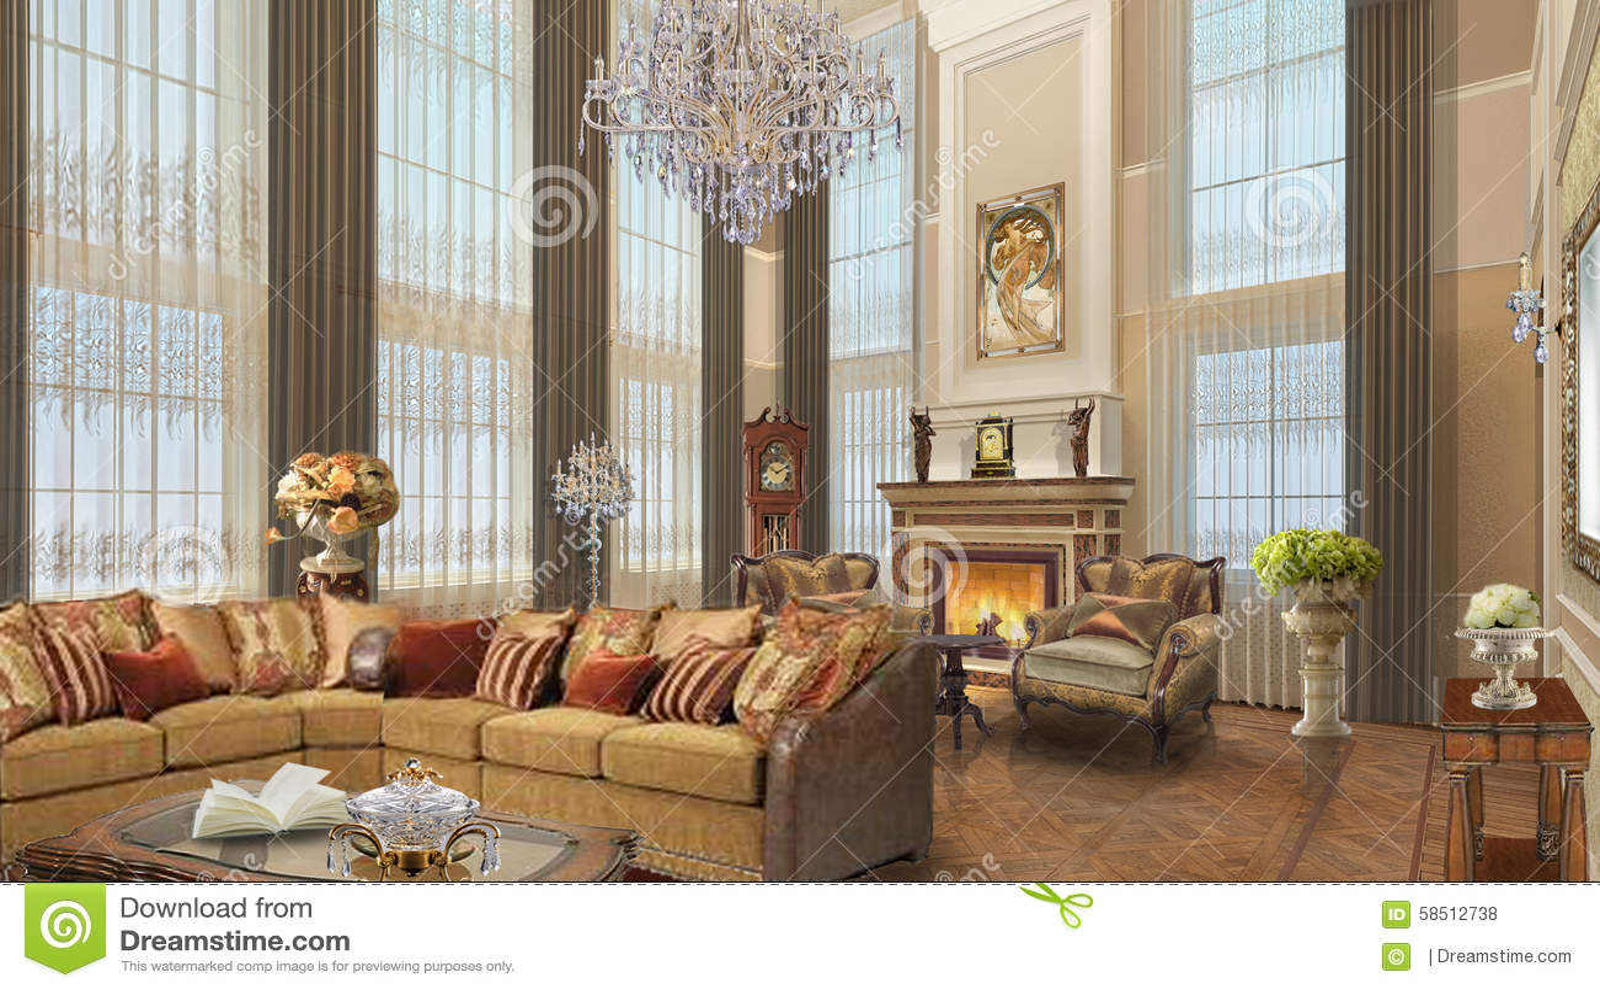 Design de interiores casa projeto estilo cl ssico for Interiores clasicos